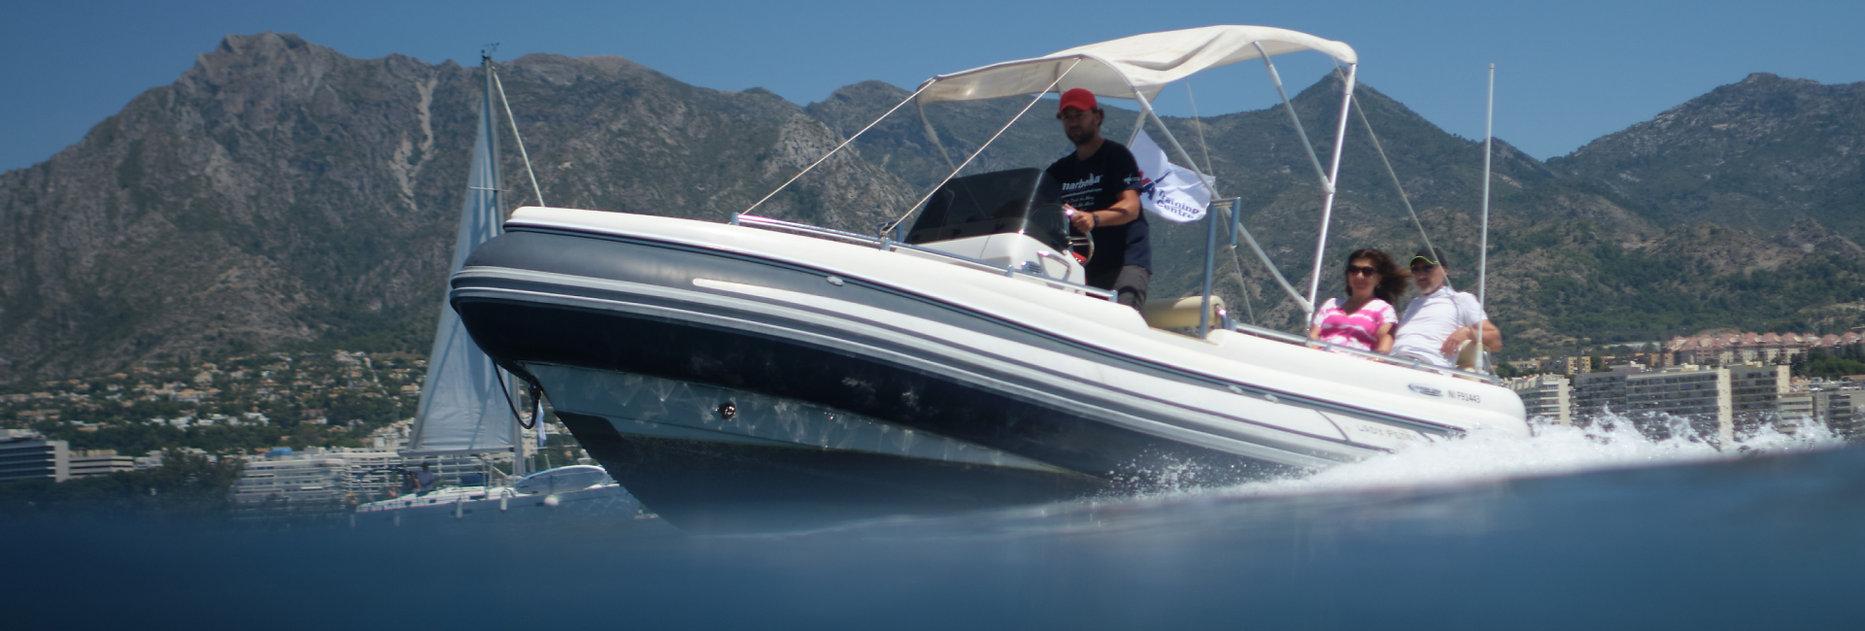 Powerboat Level 2 RYA Marbella Sailing S